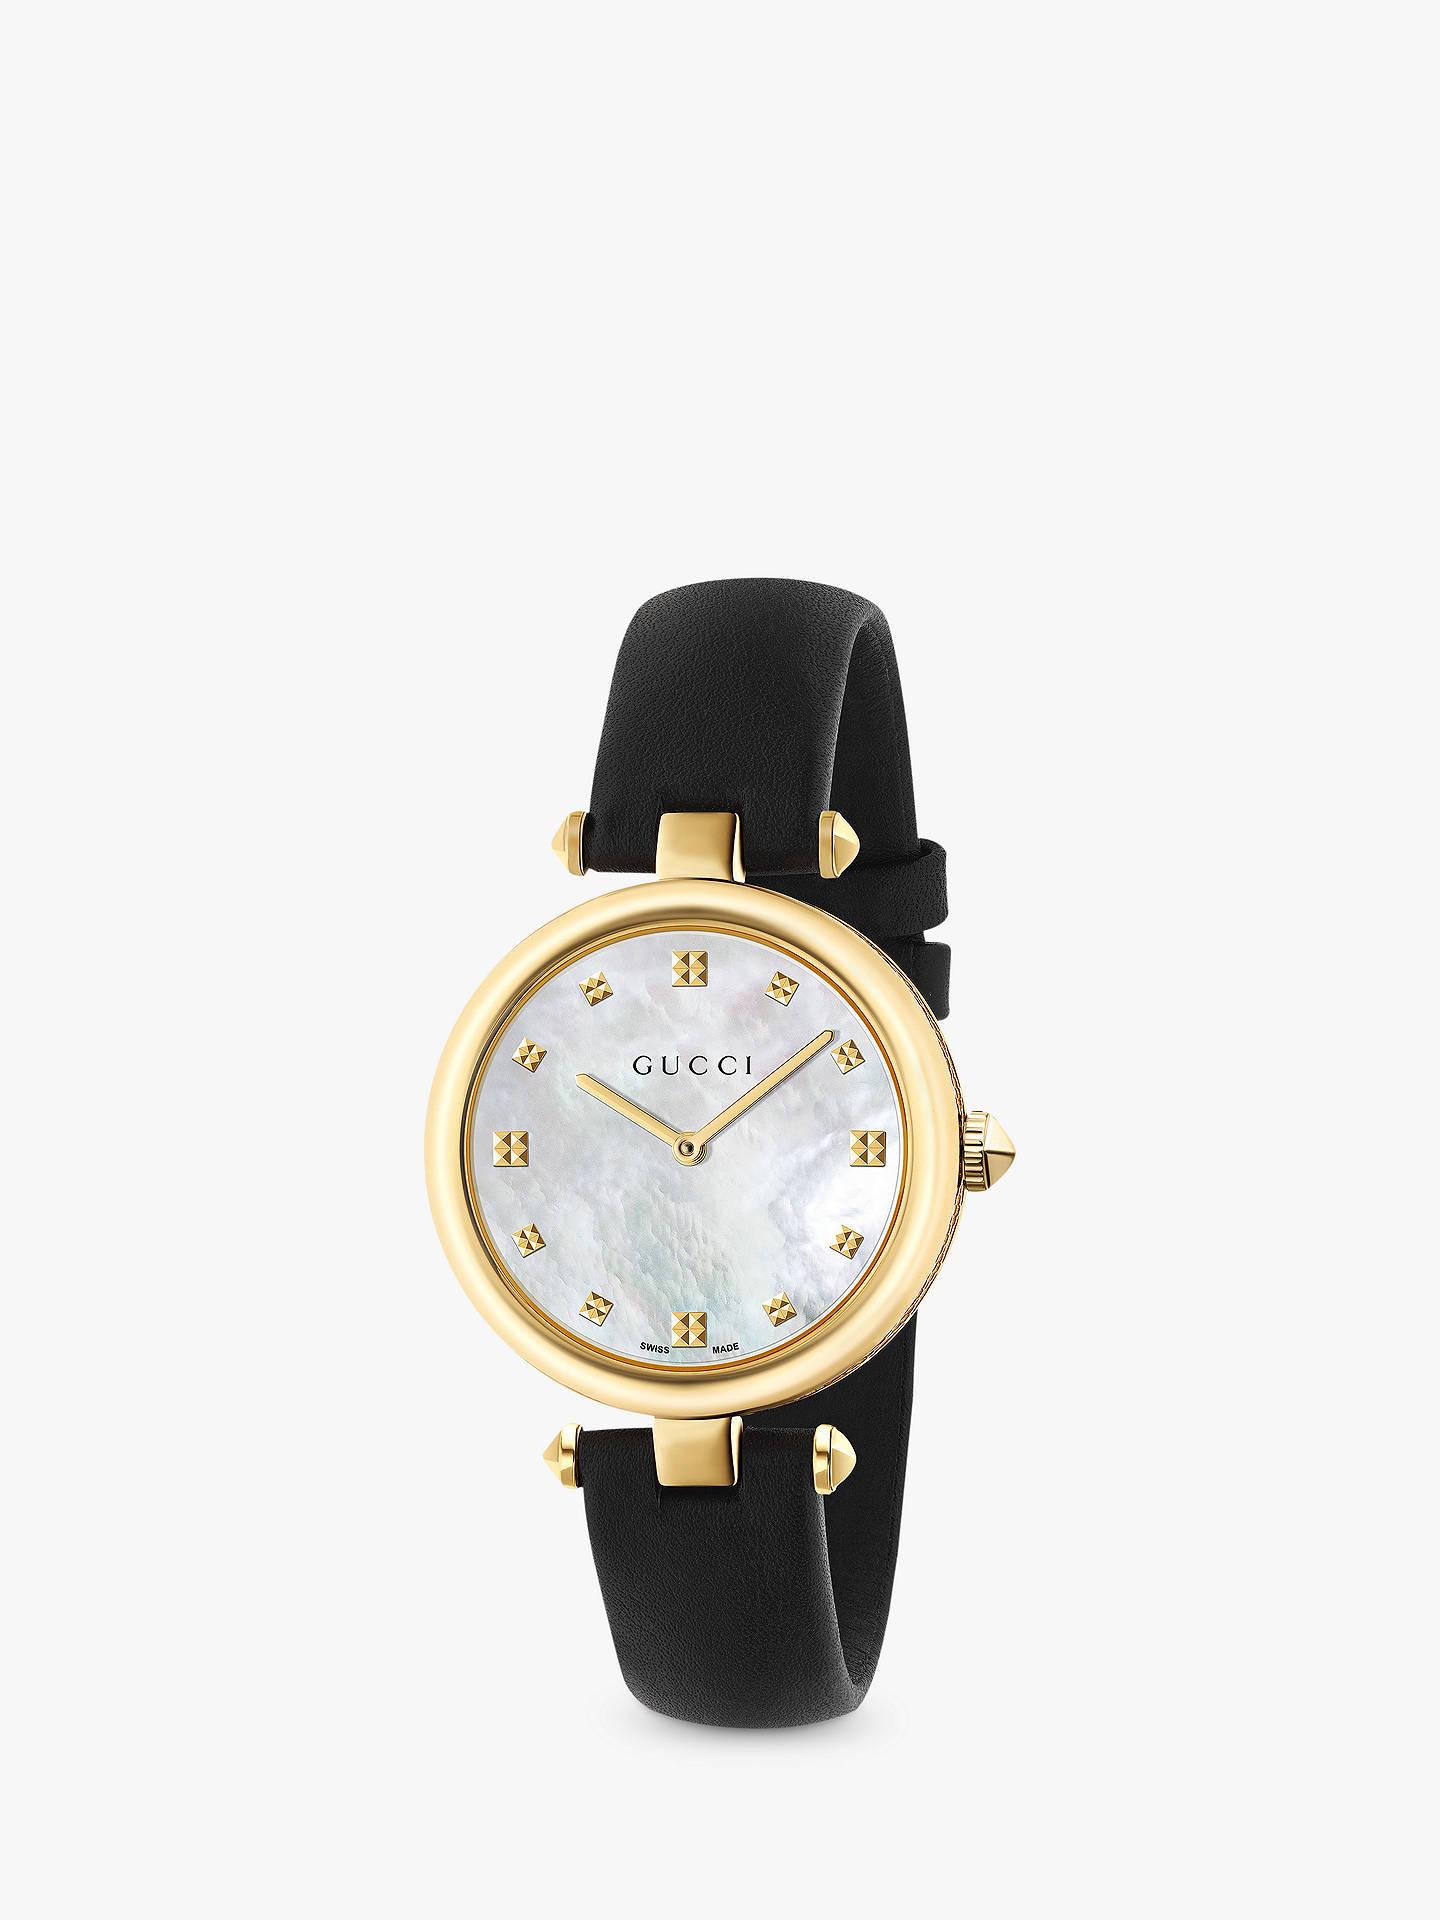 67c70f8defc Buy Gucci YA141404 Women s Diamantissima Leather Strap Watch